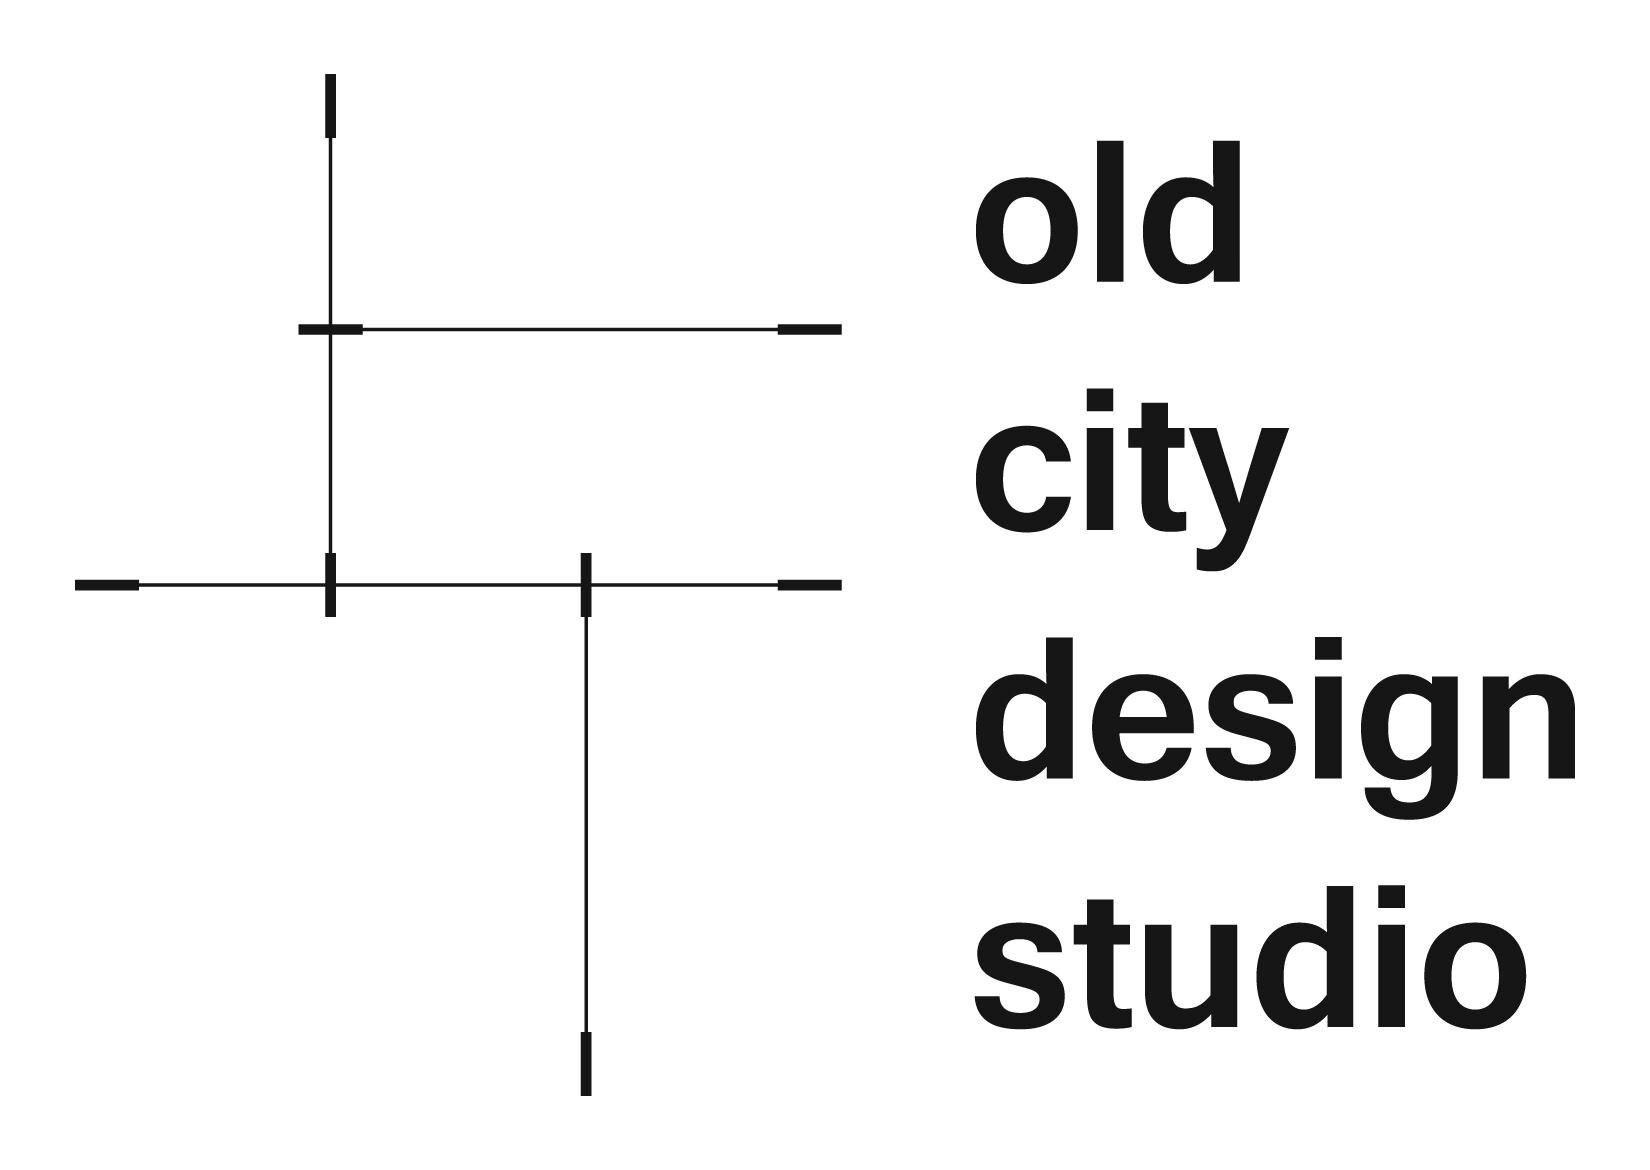 OCDS_Logo with text 300 dpi.jpg